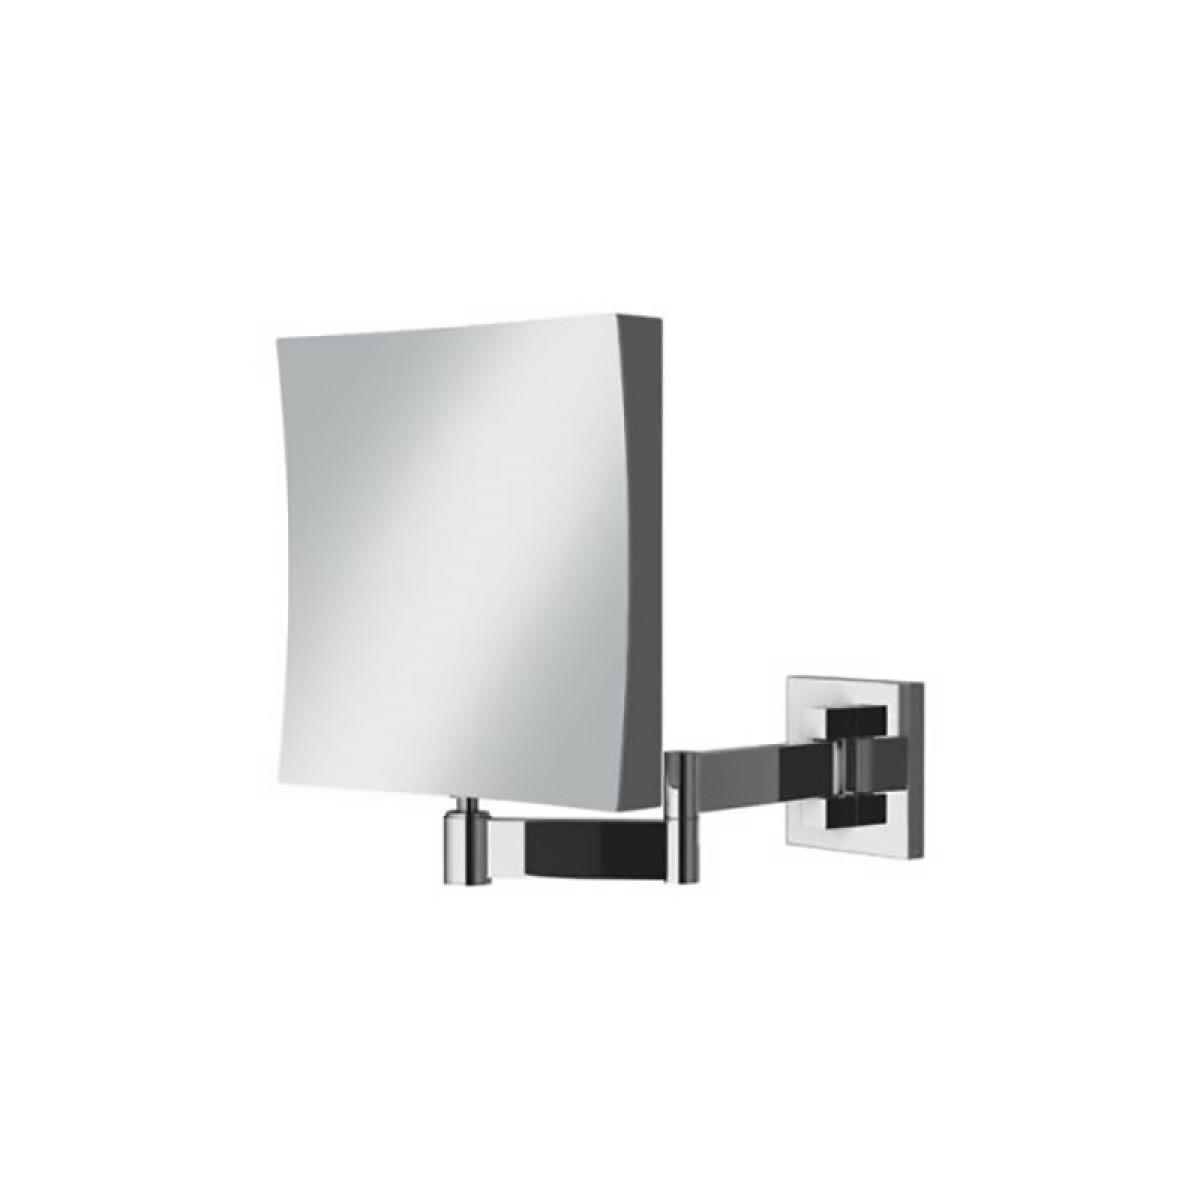 Modern bathroom mirror cabinets modern bathroom mirror - Hib Helix Square Magnifying Mirror 21500